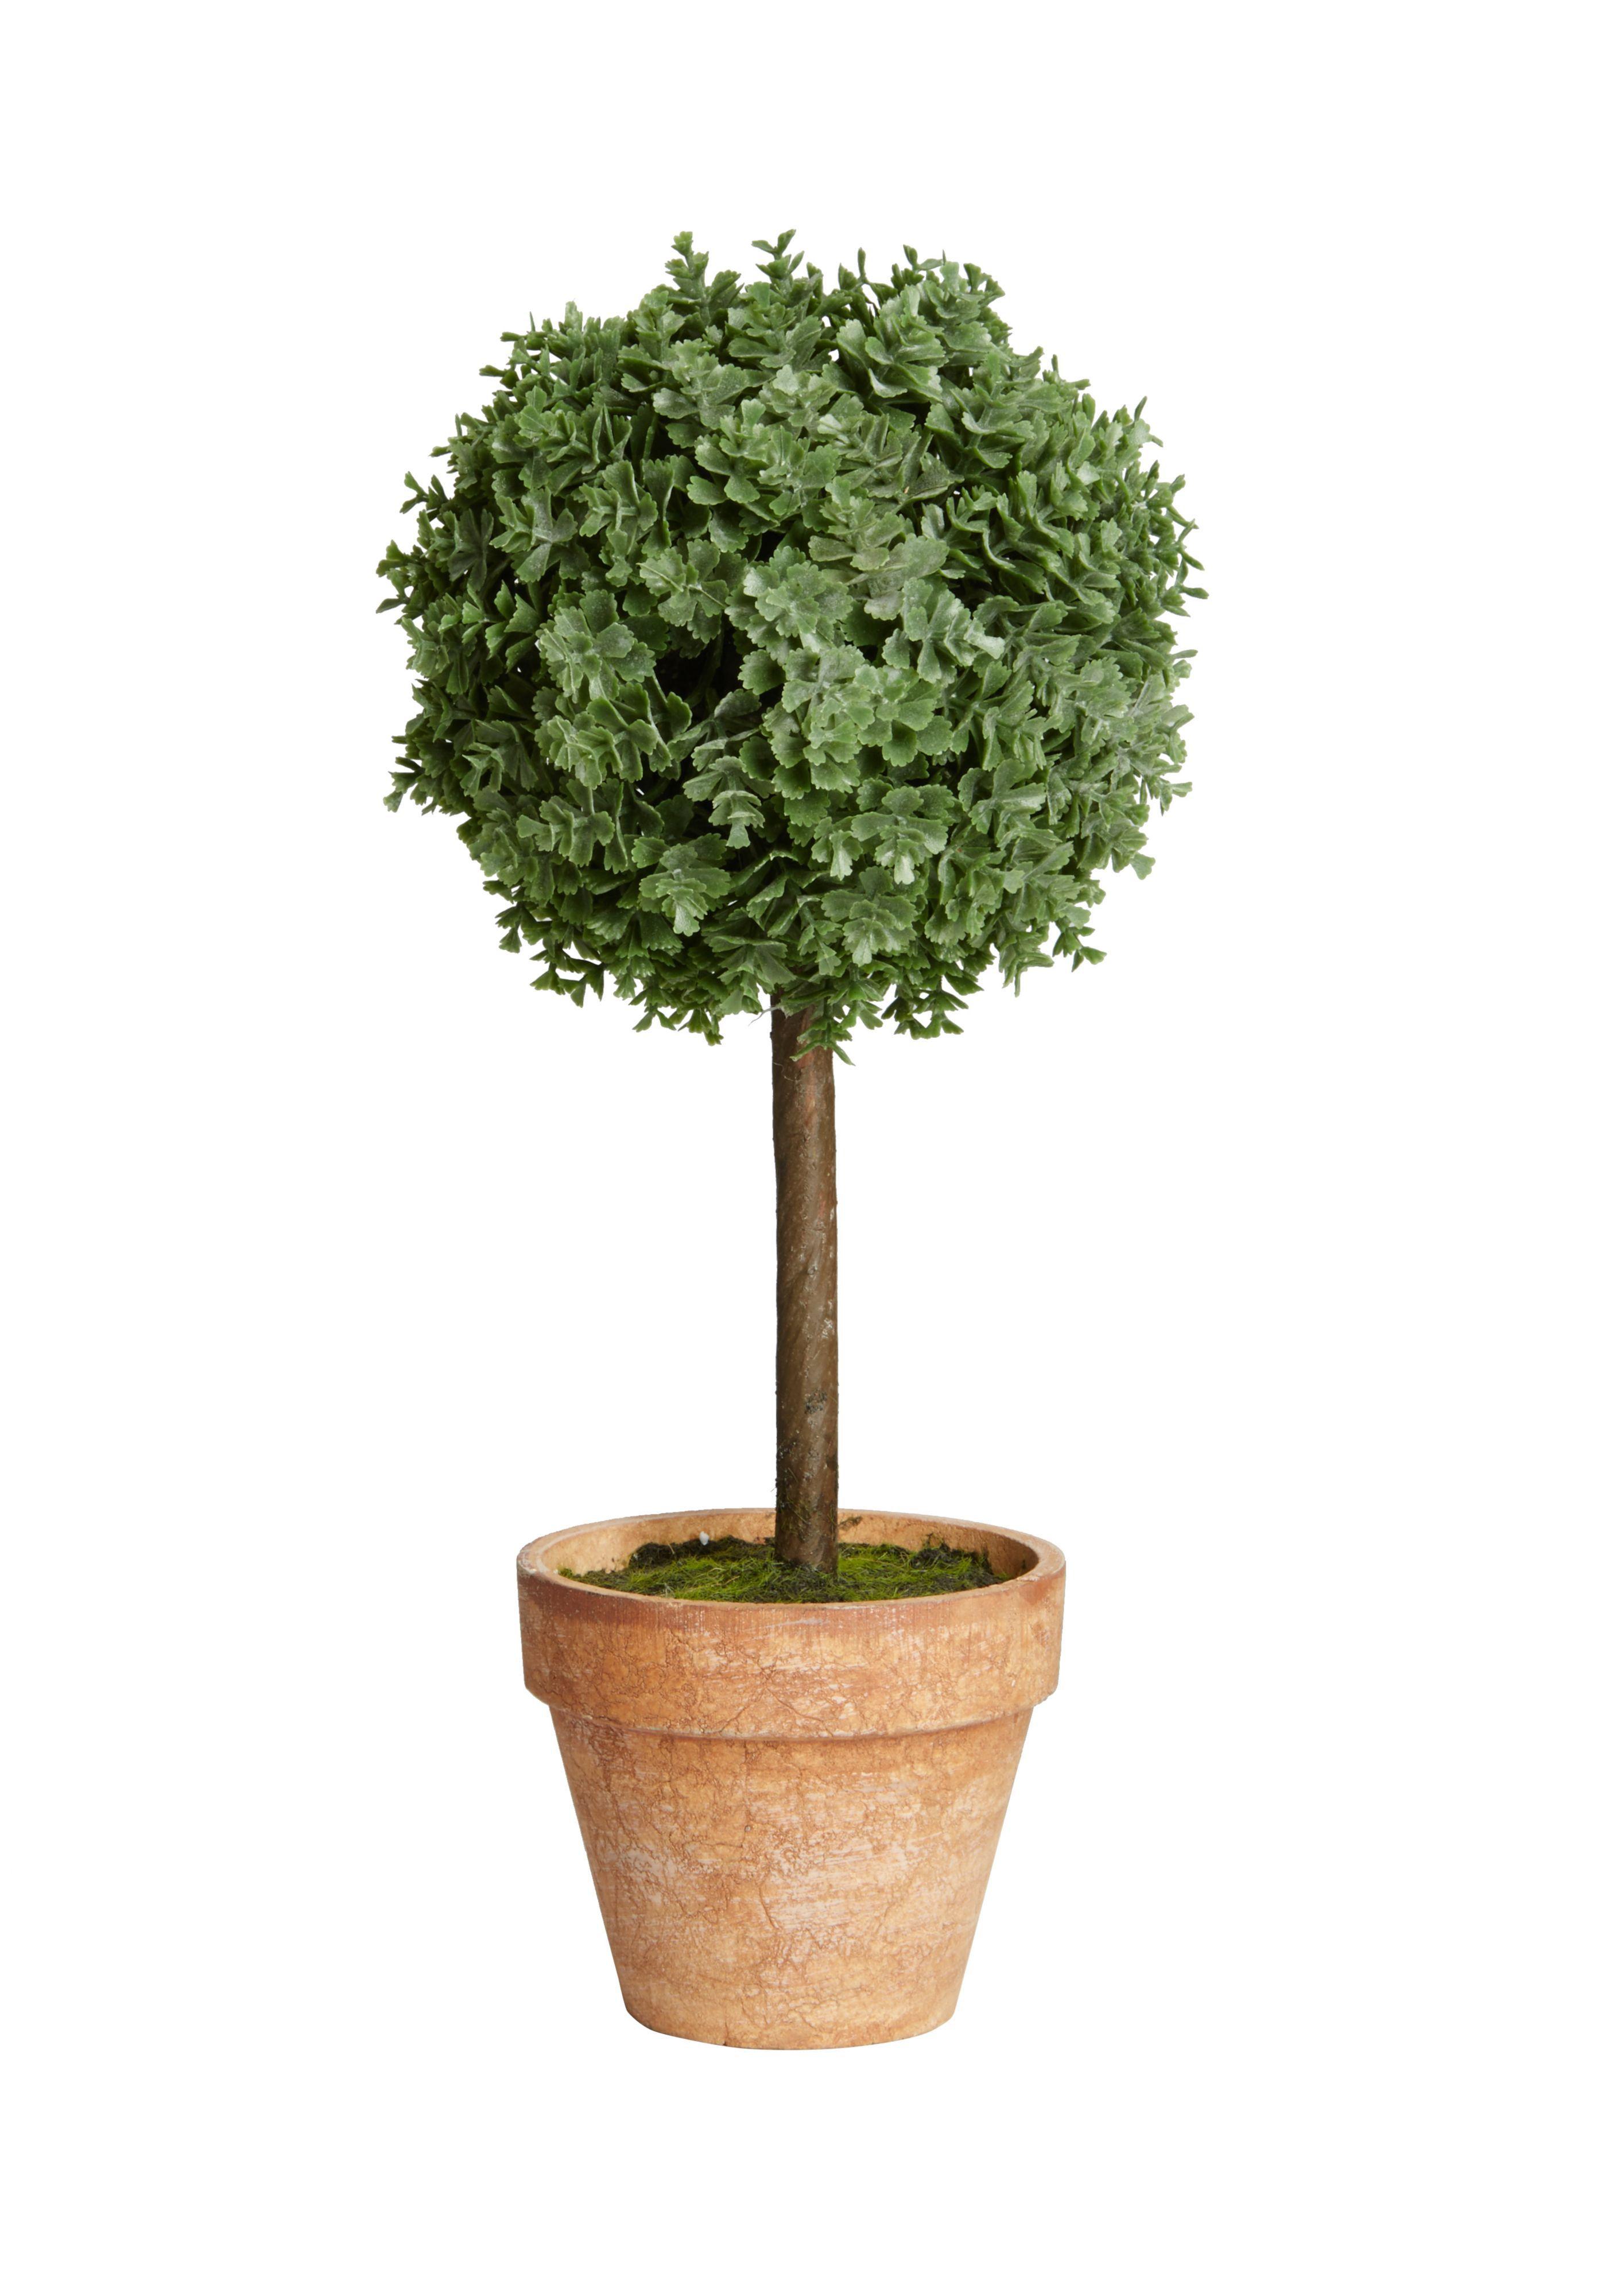 Gardman Miniature Artificial Topiary Tree | Departments ...